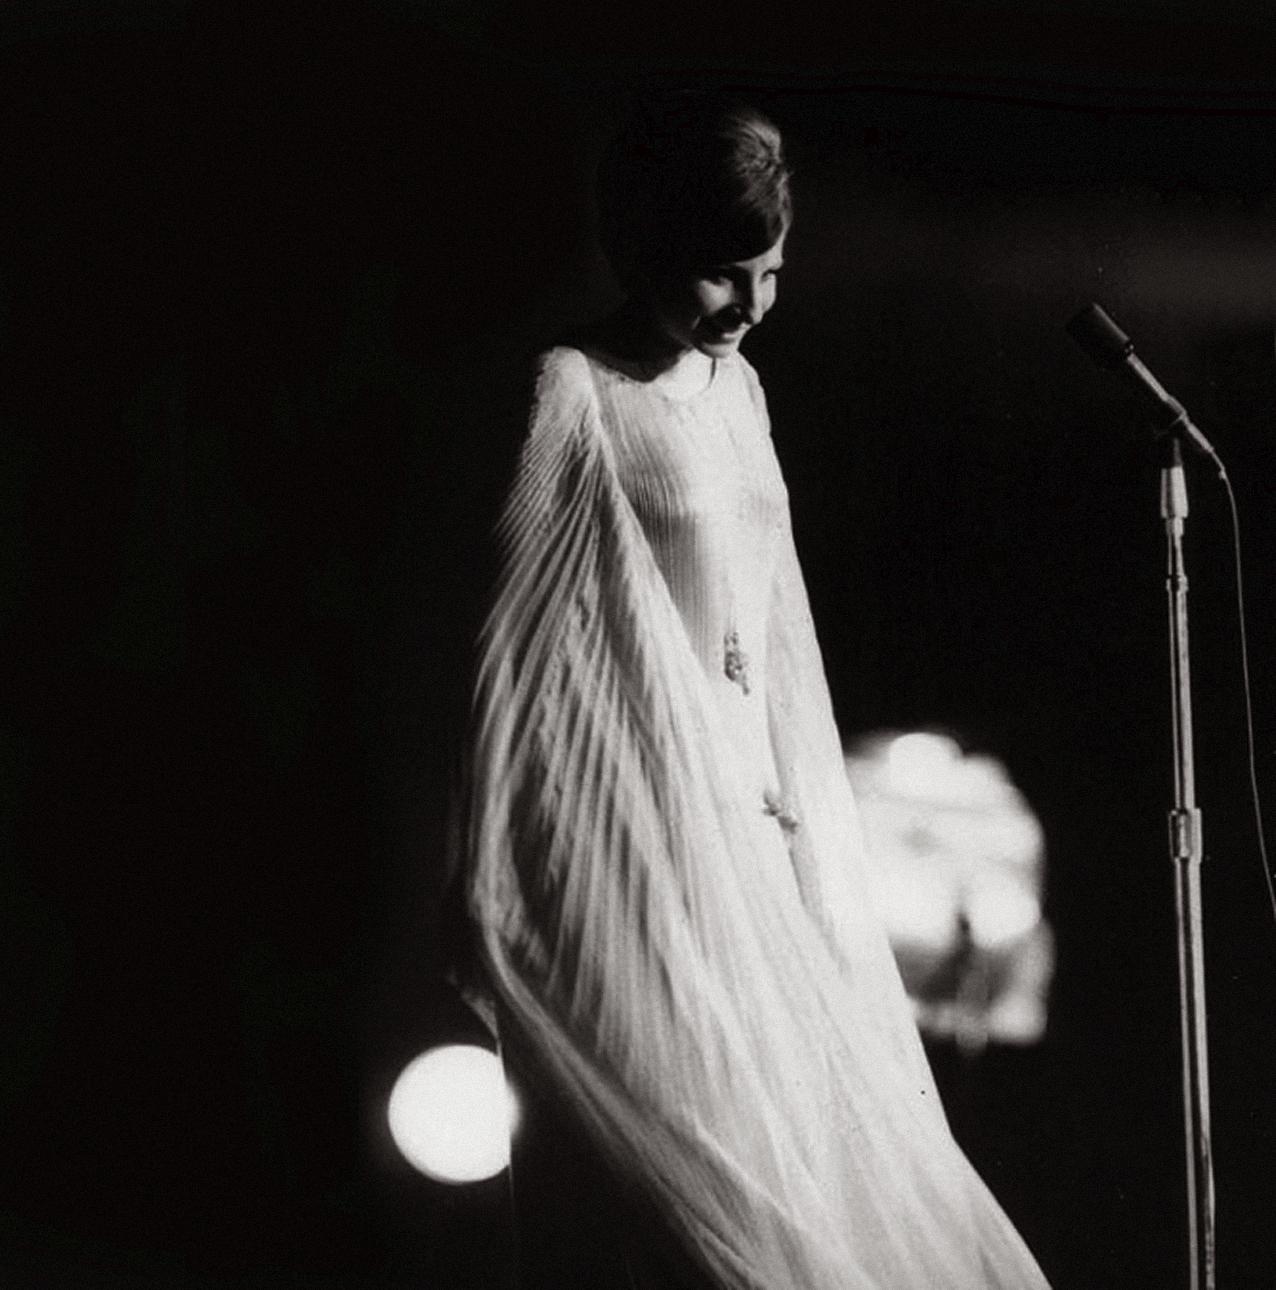 http://2.bp.blogspot.com/-DBYD7MHg9wc/Tr90GV2bPTI/AAAAAAAADU0/b__BRjh8g54/s1600/Streisand-Central-Park----.jpg